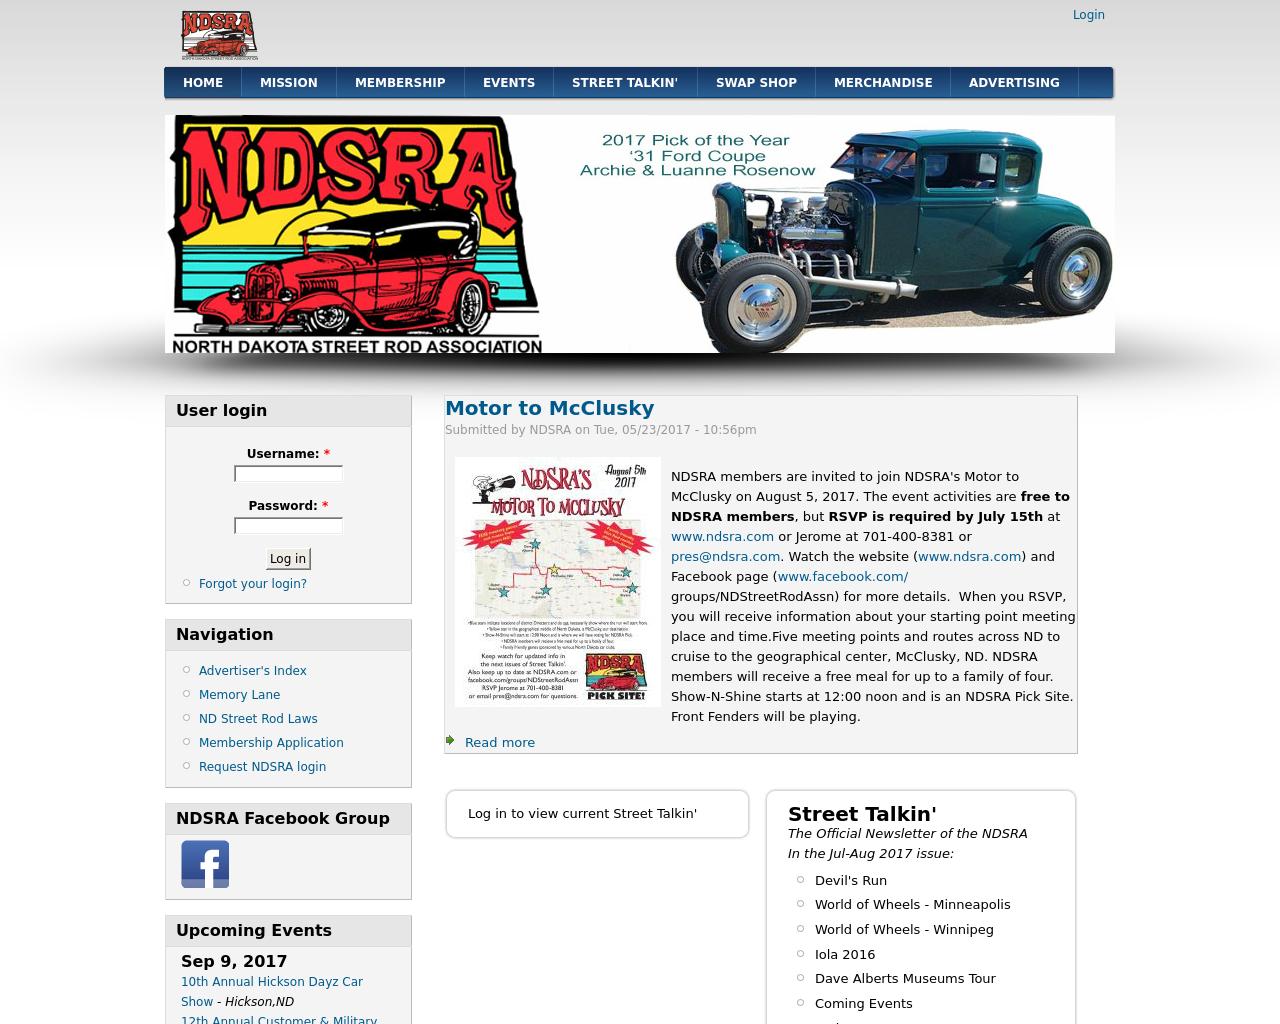 NDSRA-Advertising-Reviews-Pricing